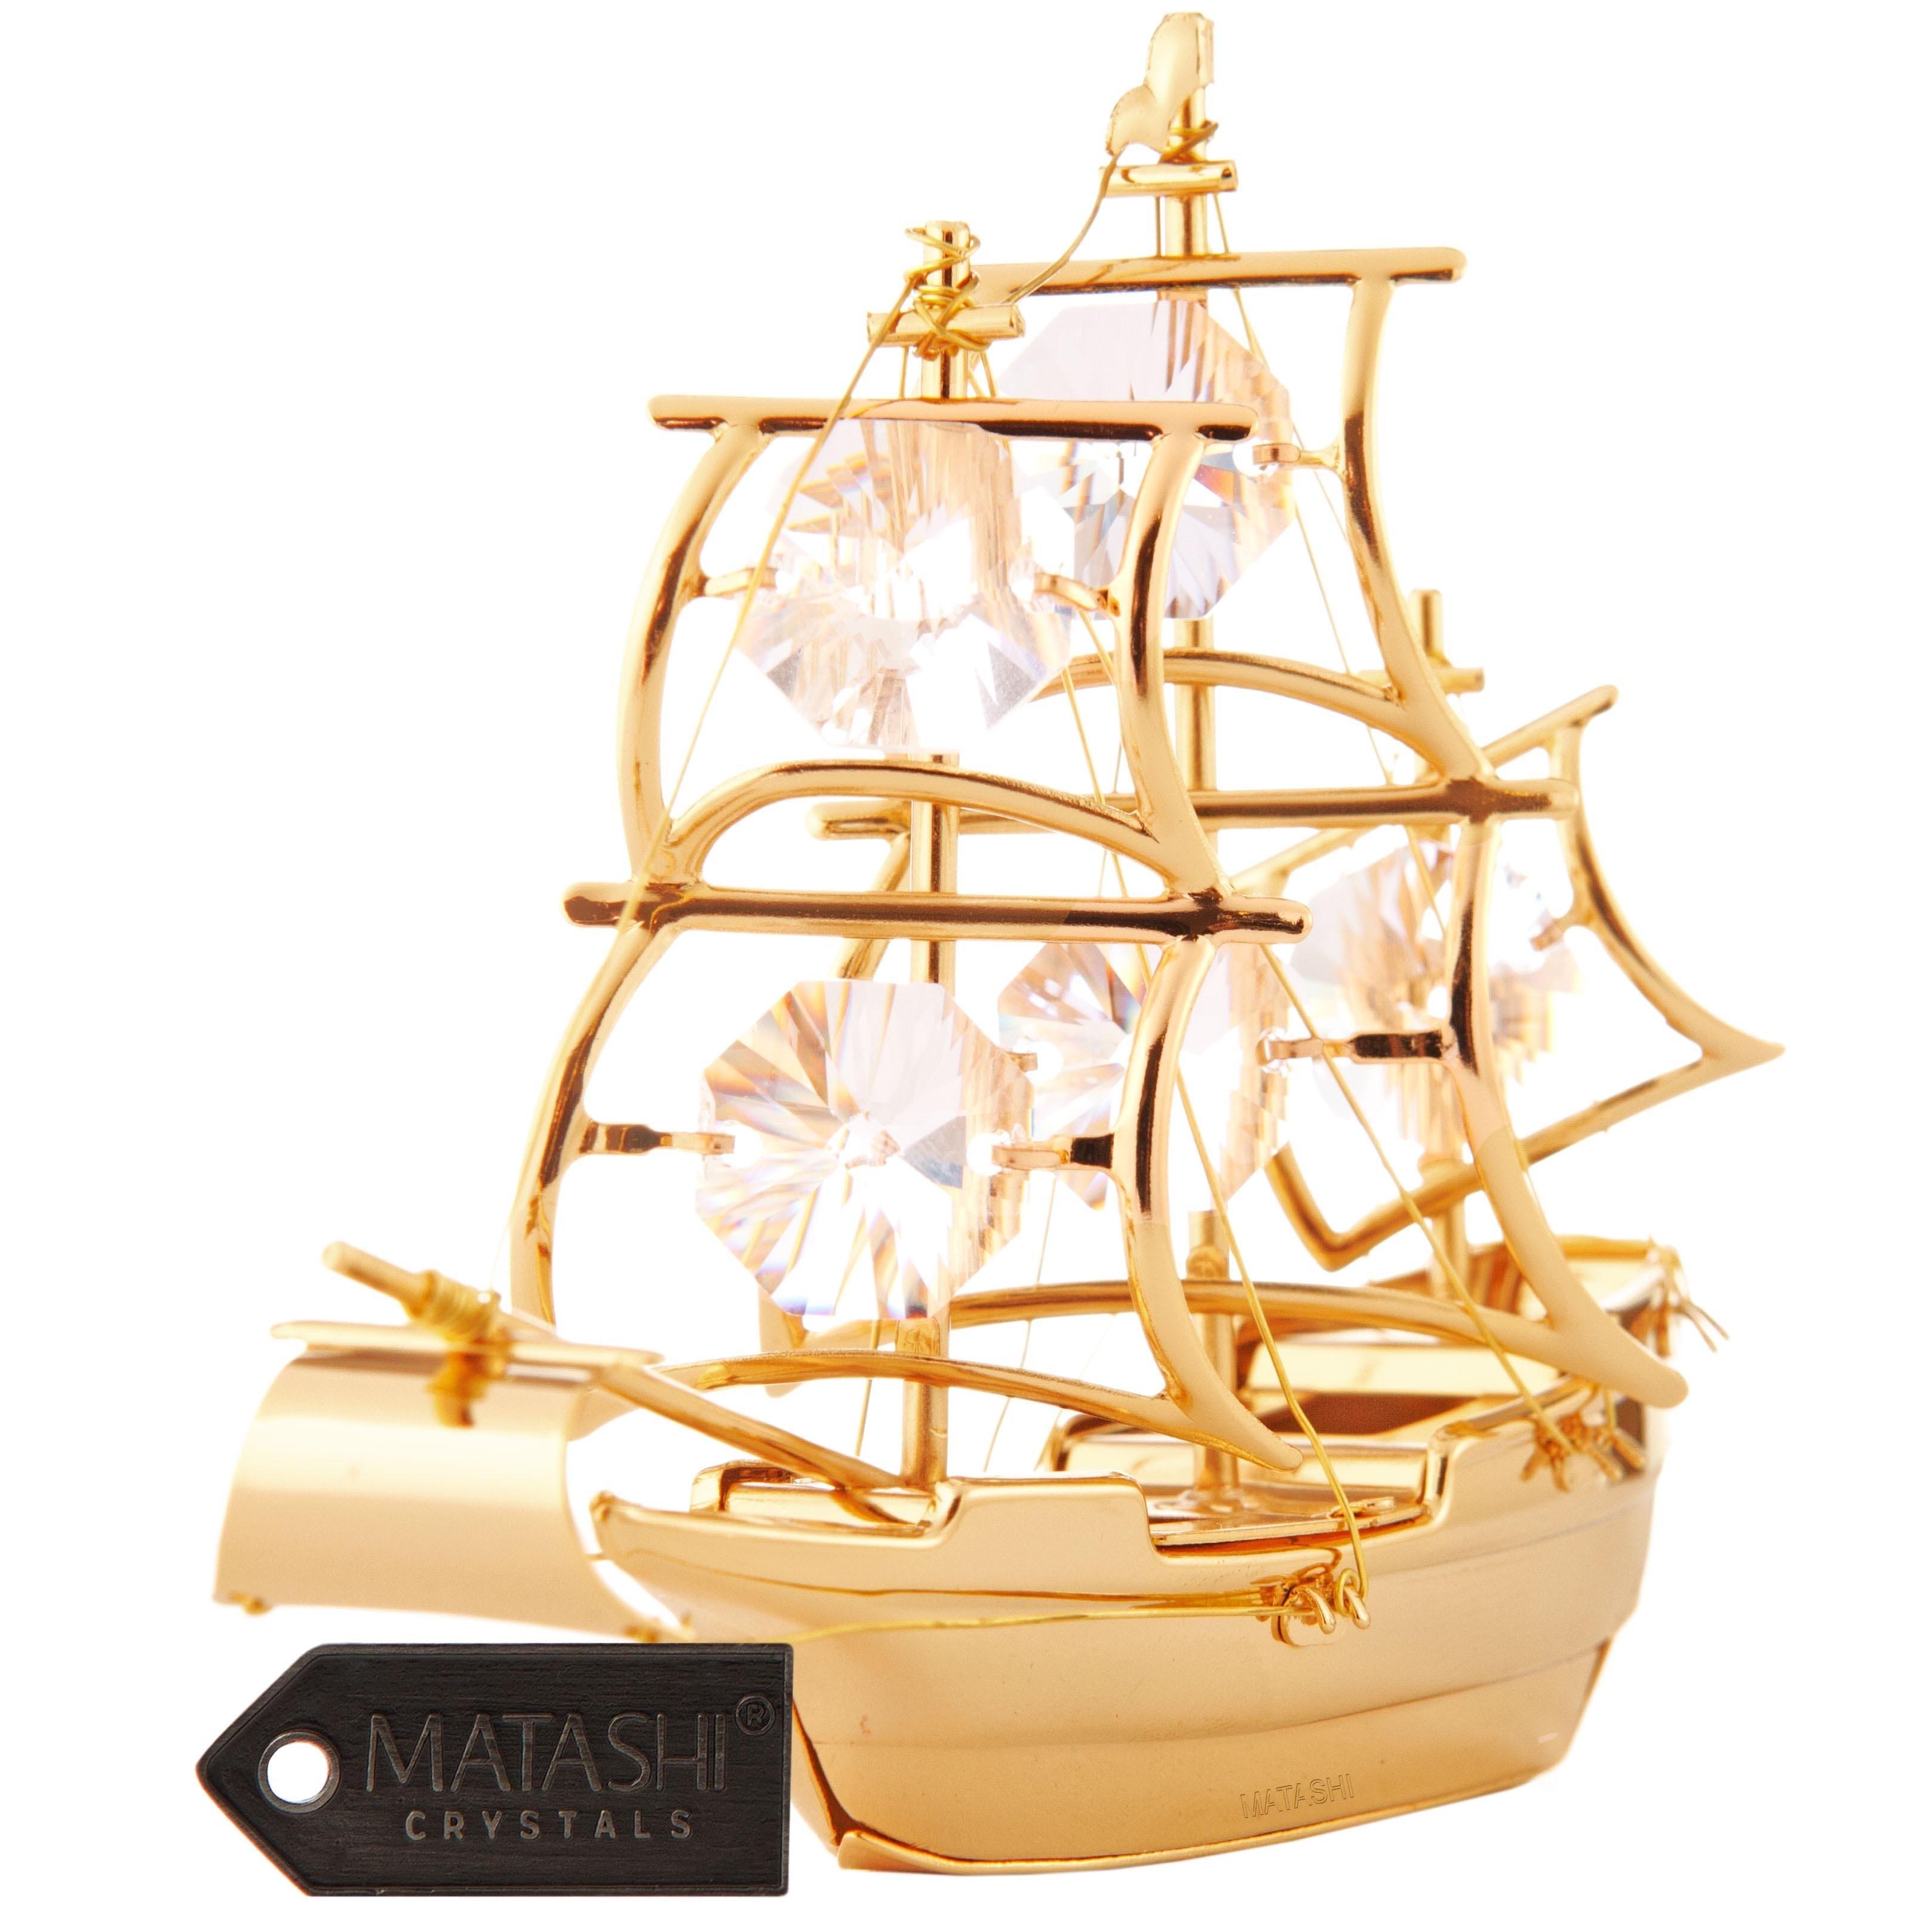 Matashi 24K Gold Plated Mayflower Ship Ornament with Genu...